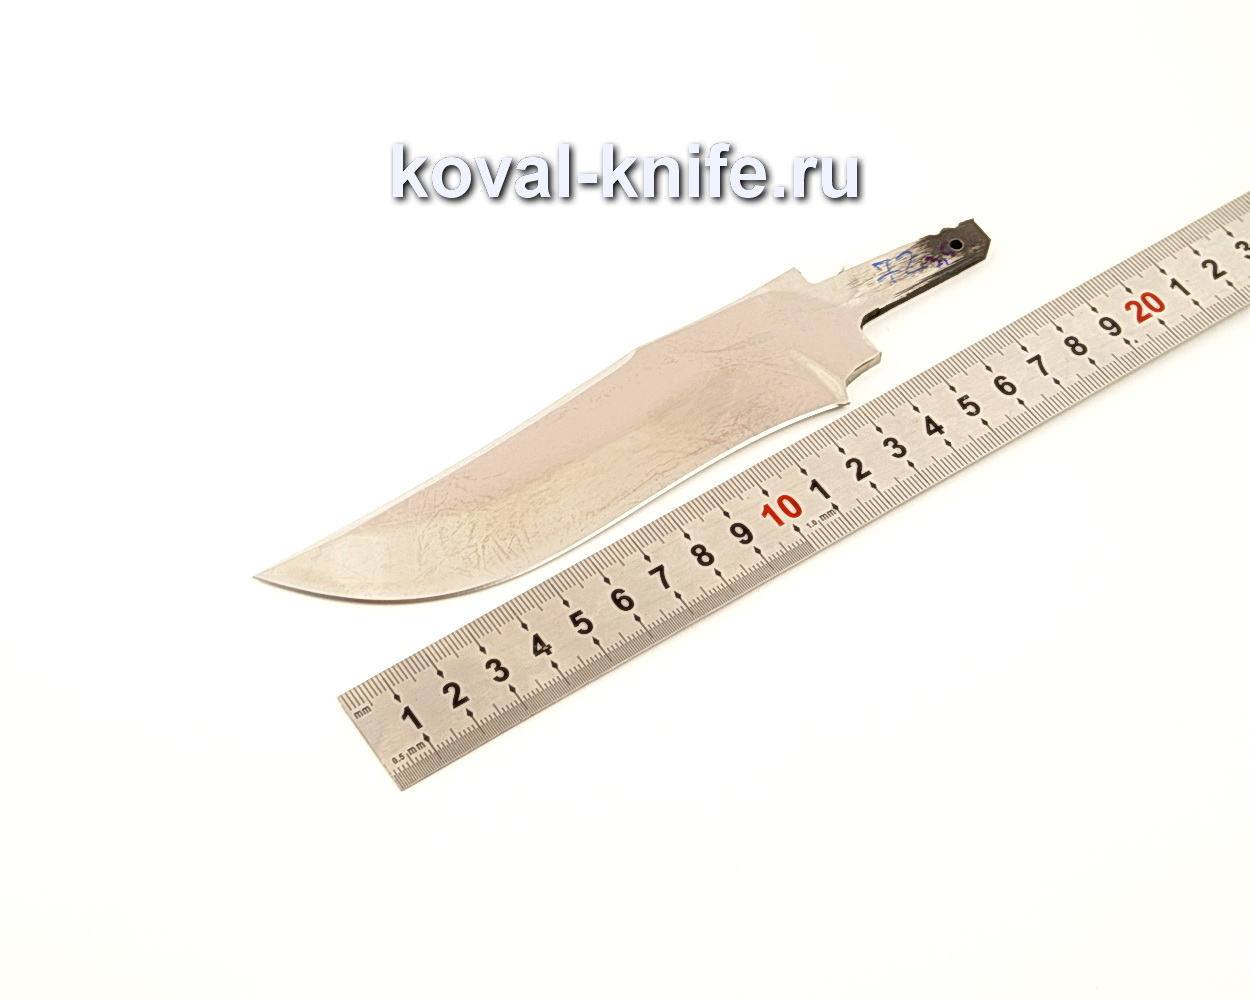 Клинок для ножа из кованой 95Х18 N72